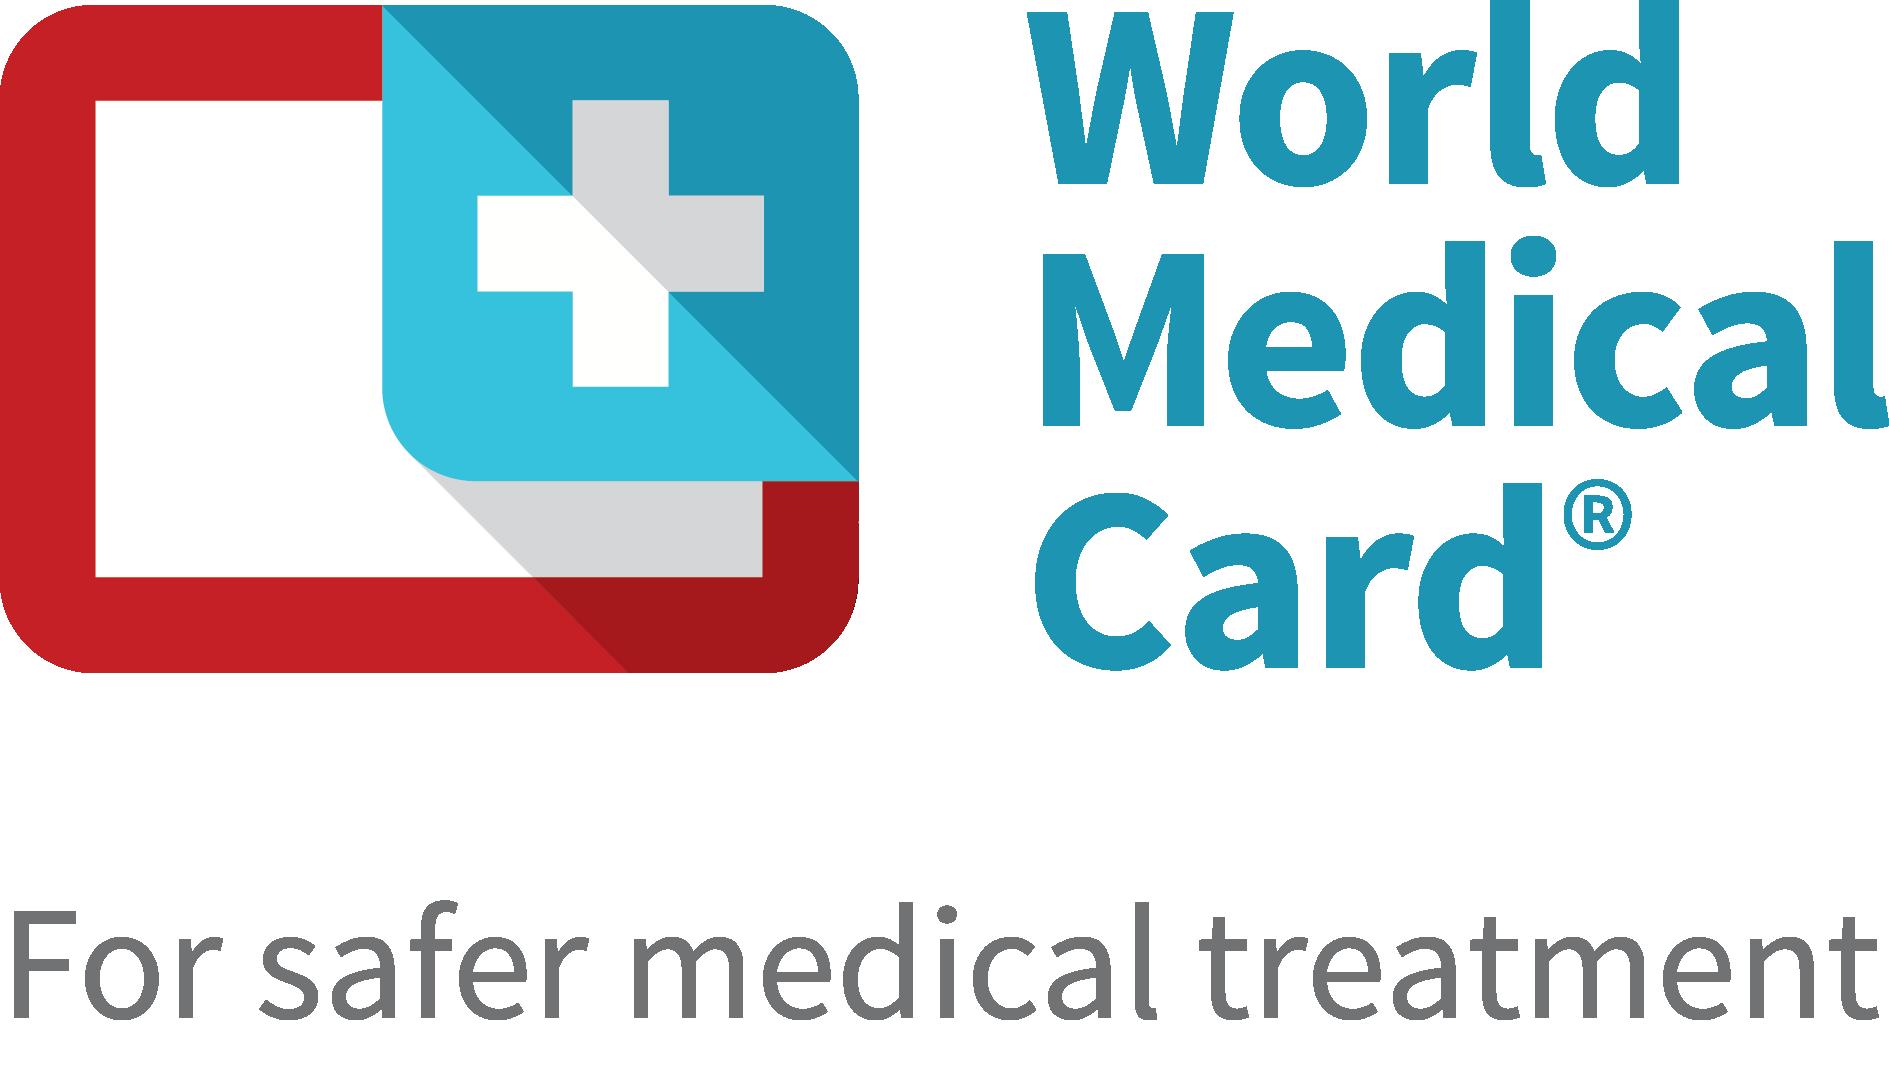 world medical card logo.png